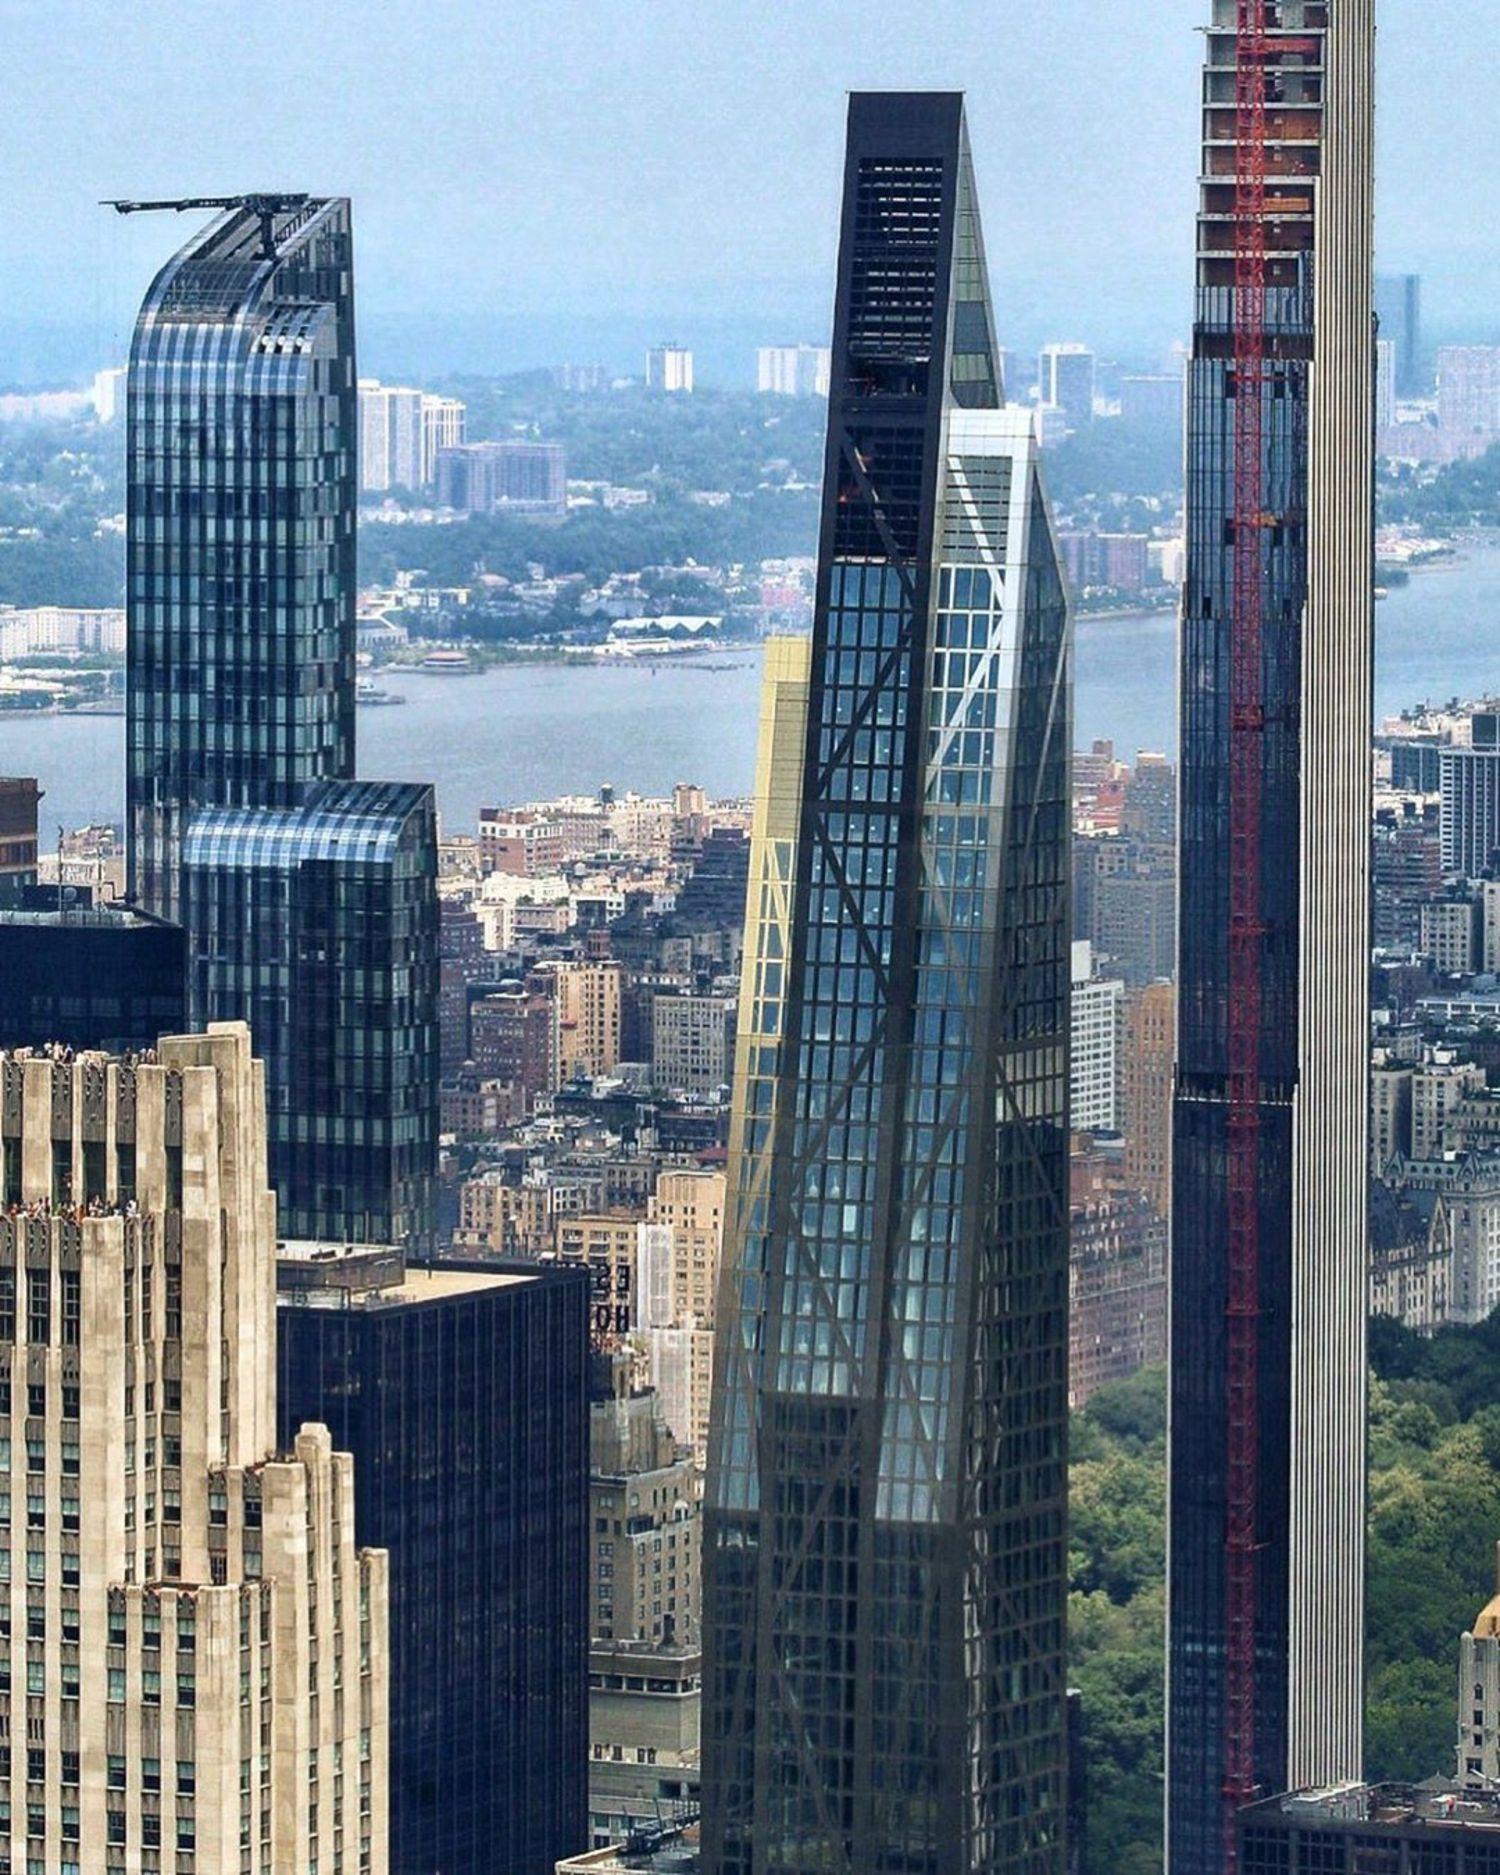 Billionaire's Row, Midtown, Manhattan